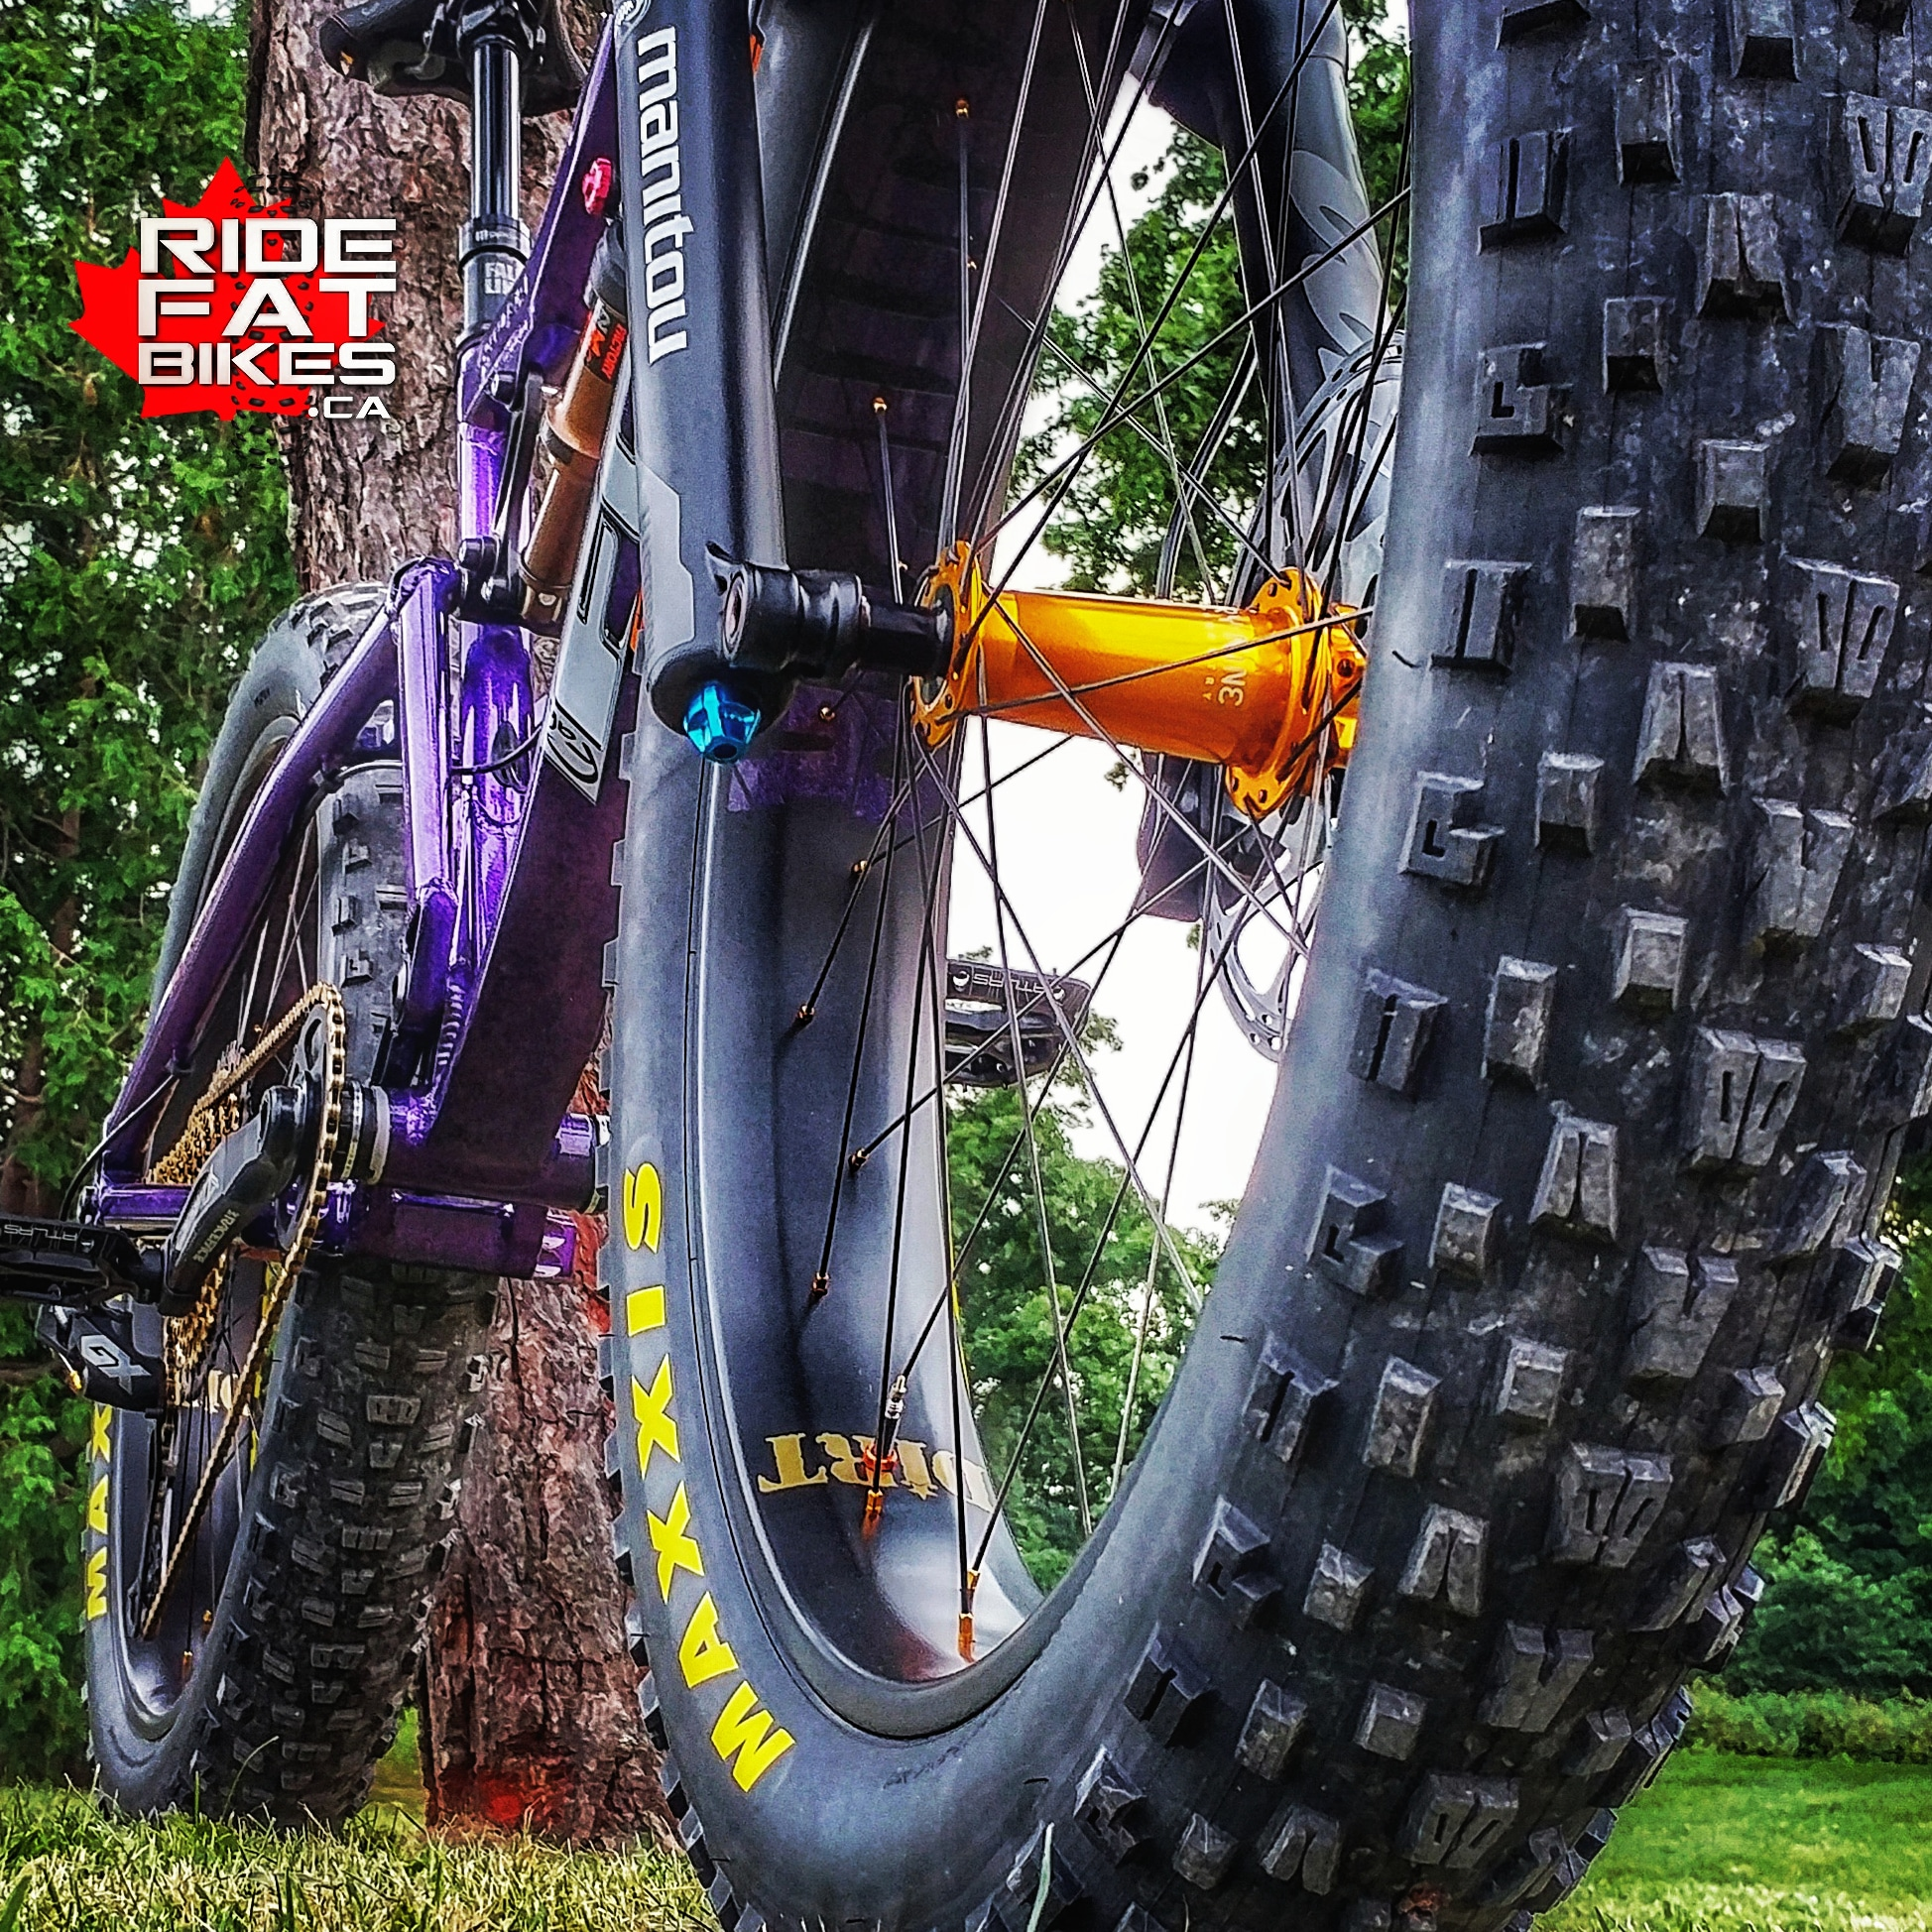 FOES MUTZ 150 - SRAM XX1 EAGLE - 32 lbs RACE WEIGHT - custom build by RIdeFATbikes.ca